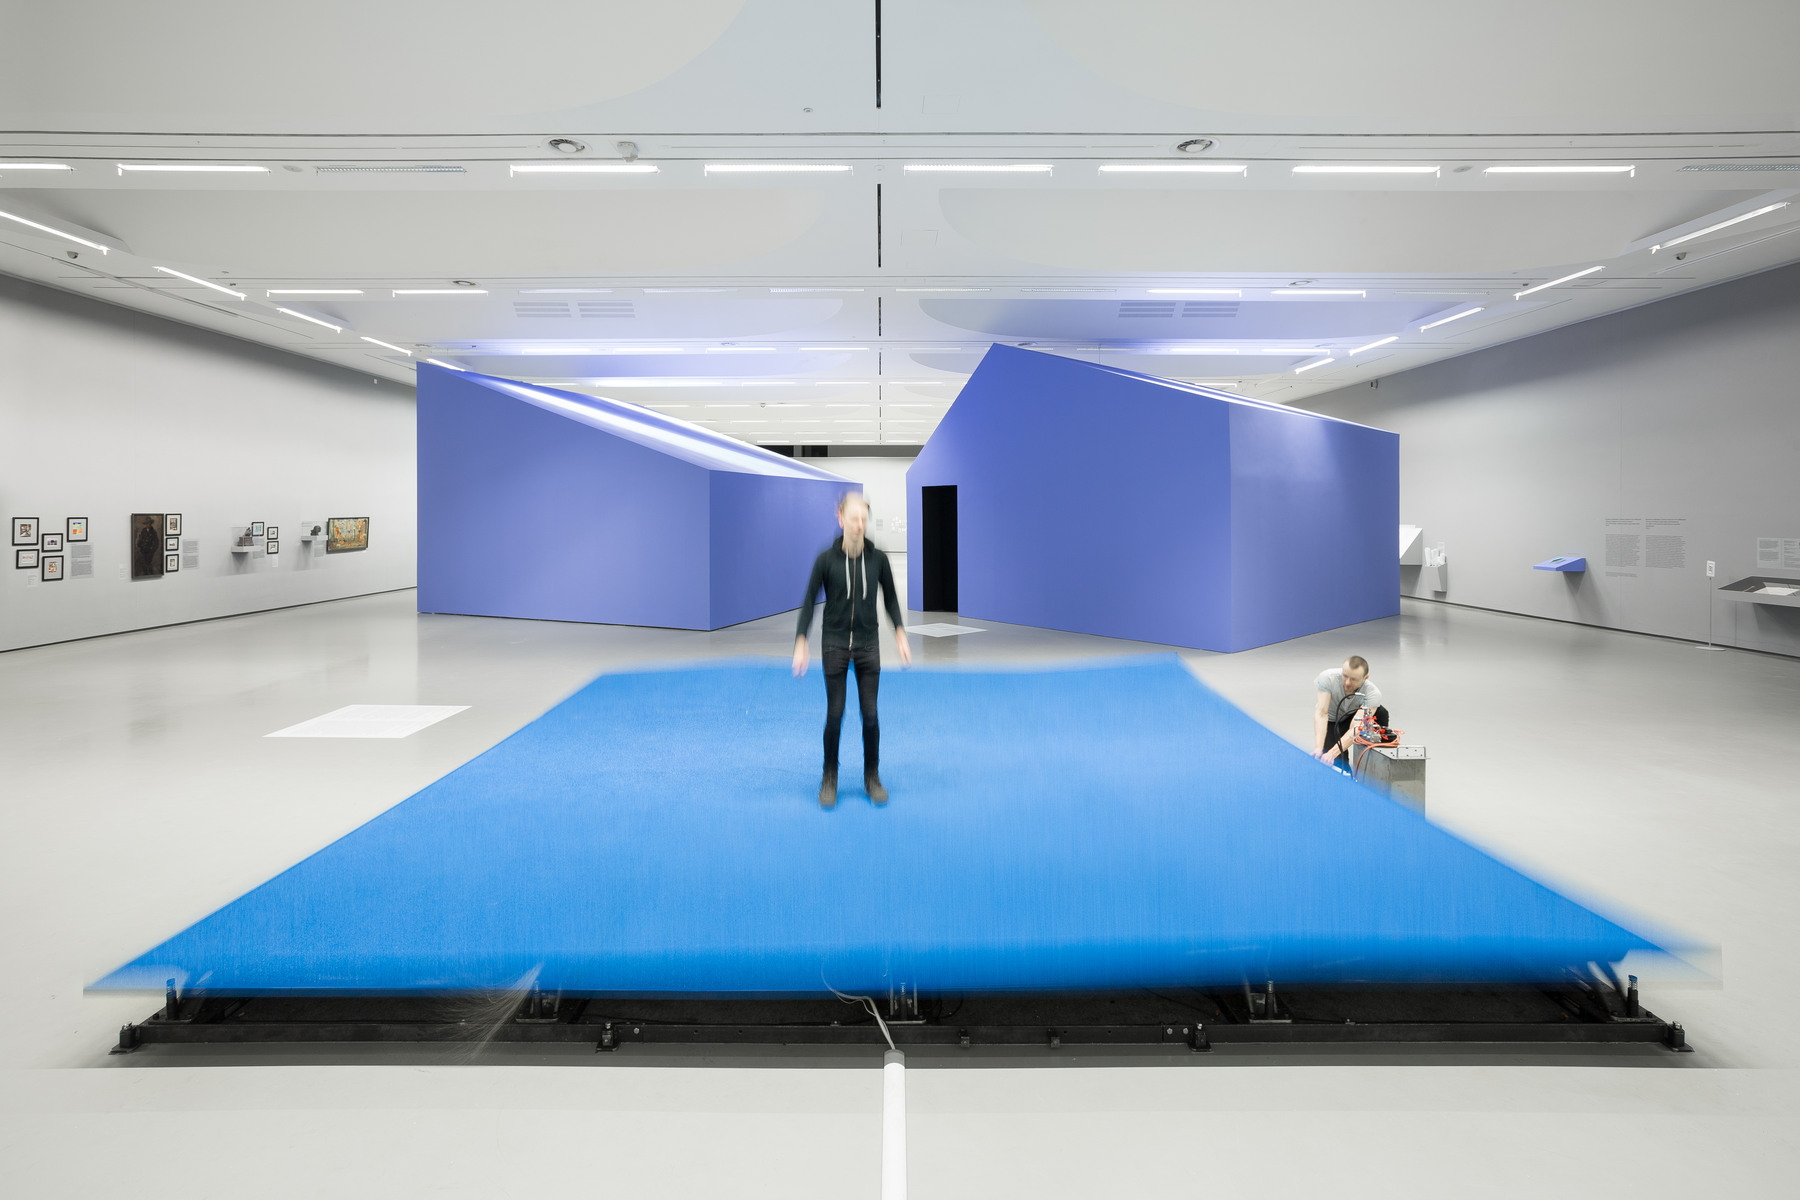 30-Citynature-Vilnius and Beyond-National-Gallery-Of-Art-Vilnius-2017-Julijonas-Urbonas